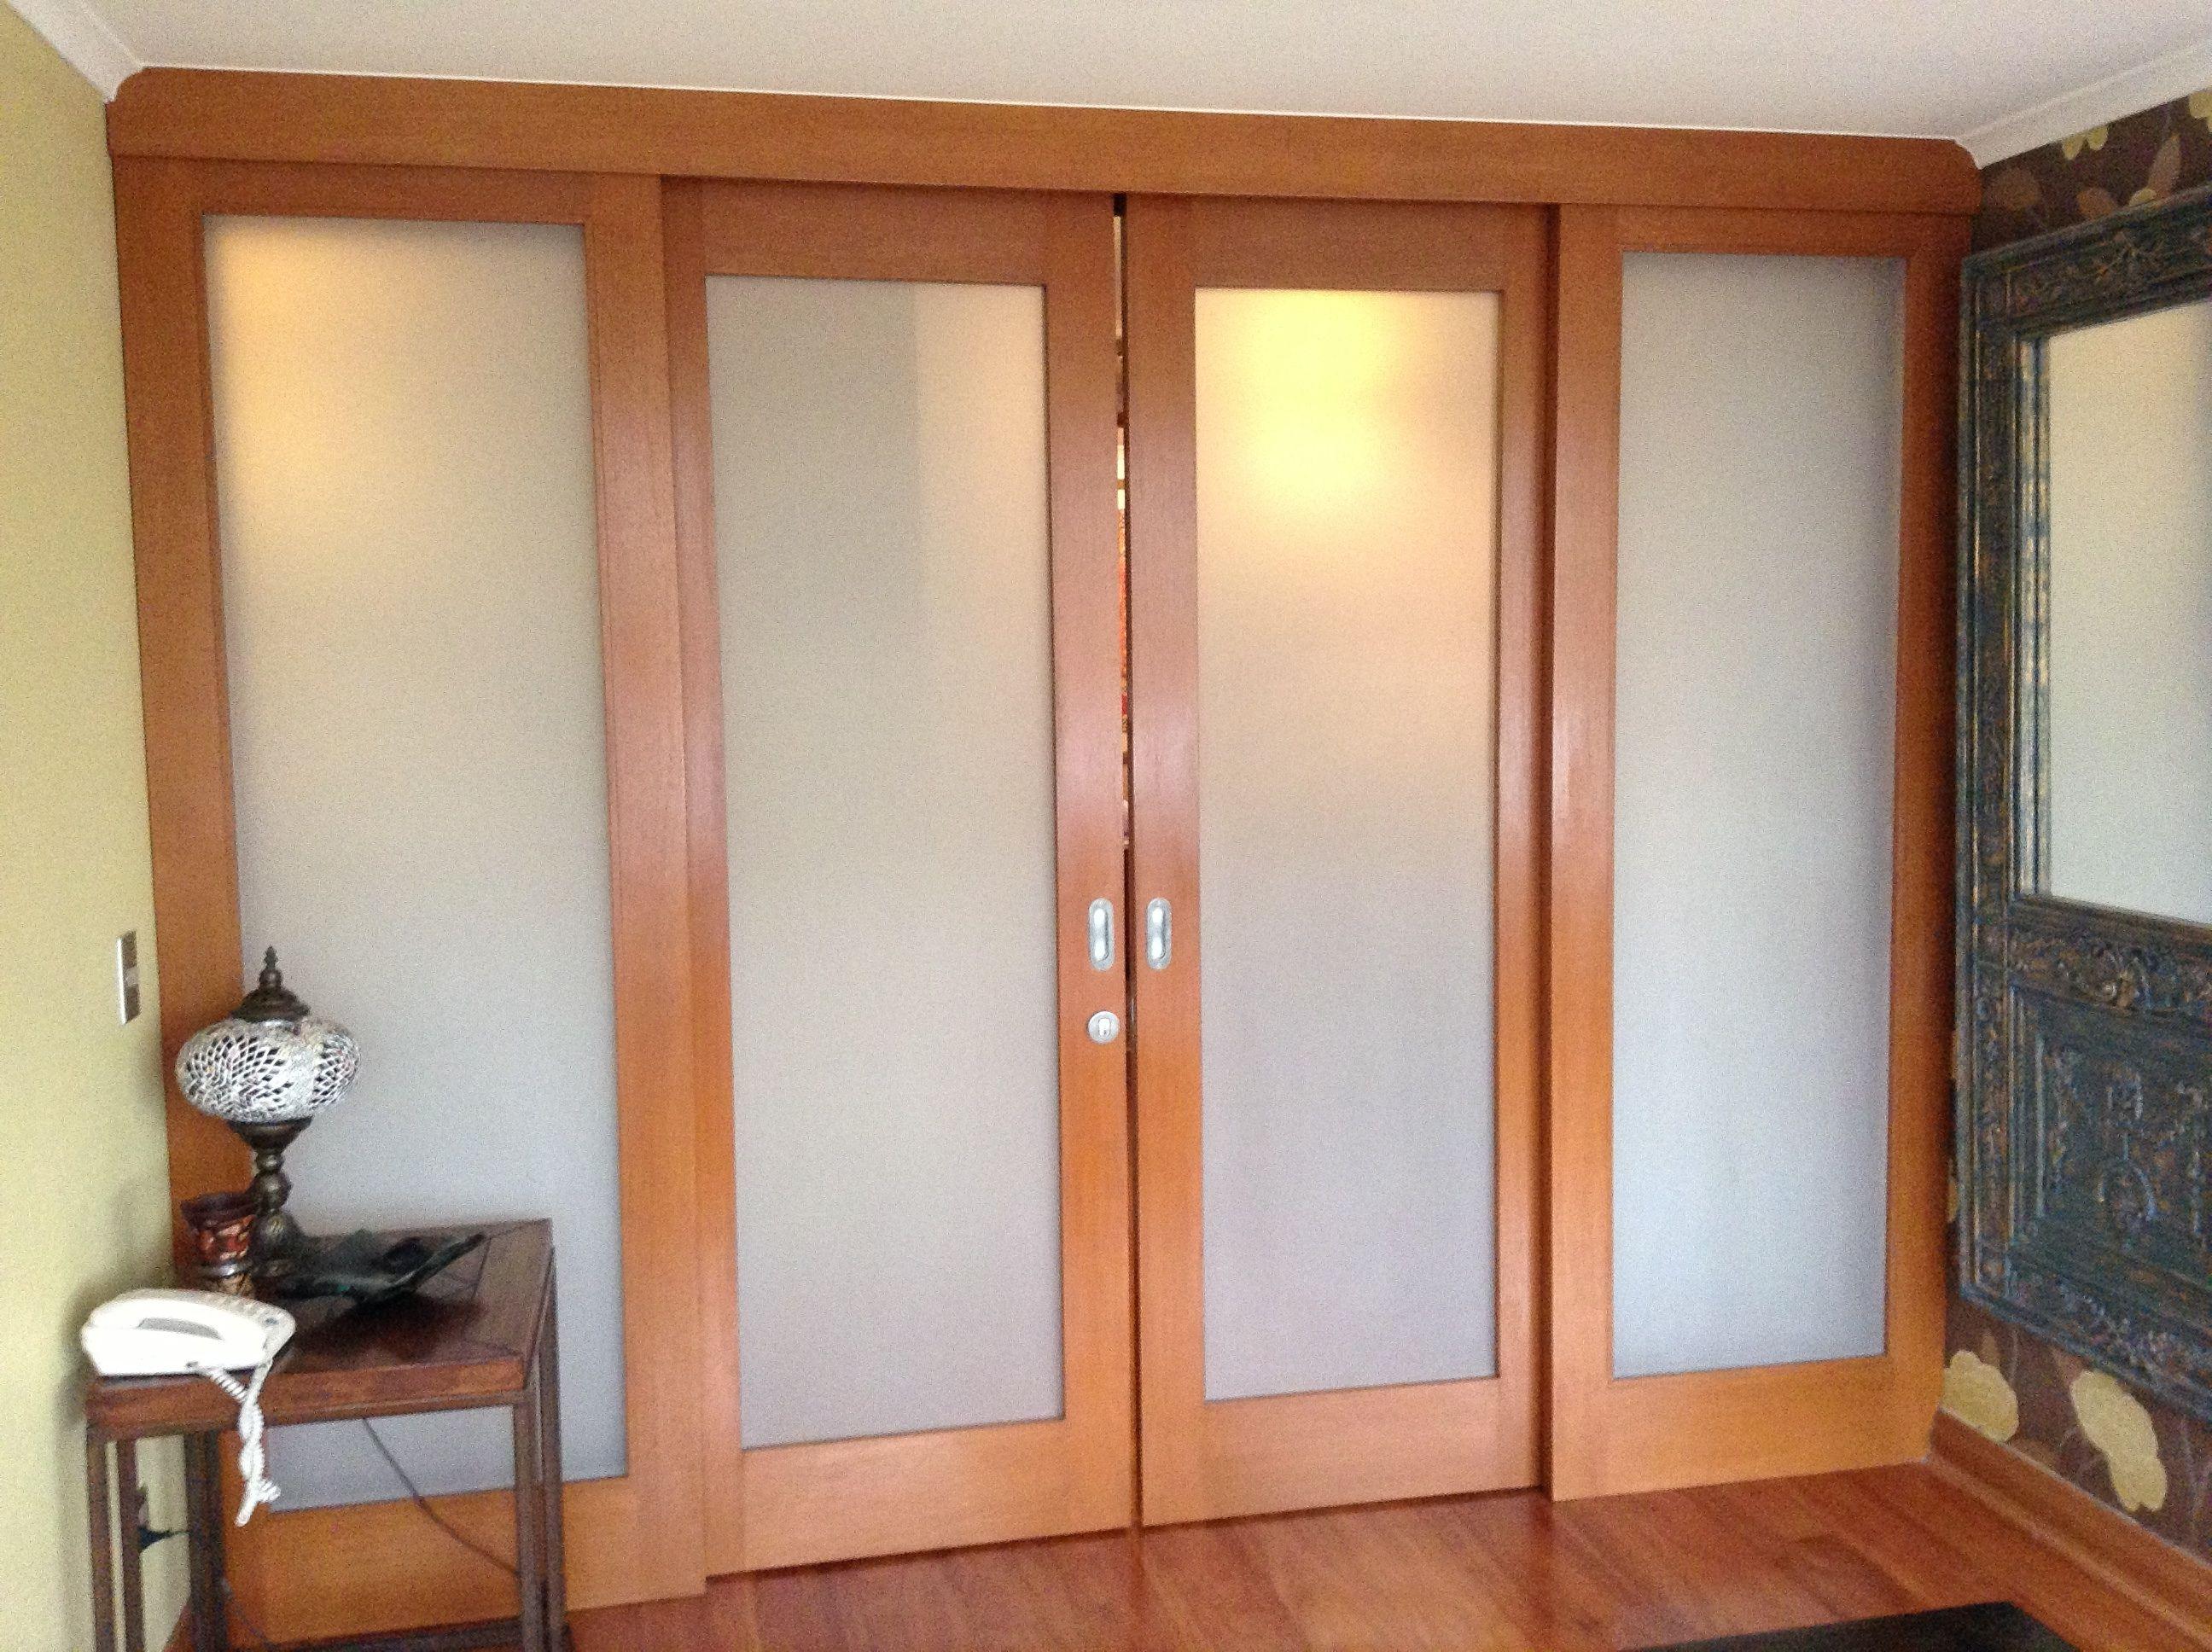 Dise o e instalaci n de puertas correderas en madera de - Puertas corredizas de madera ...